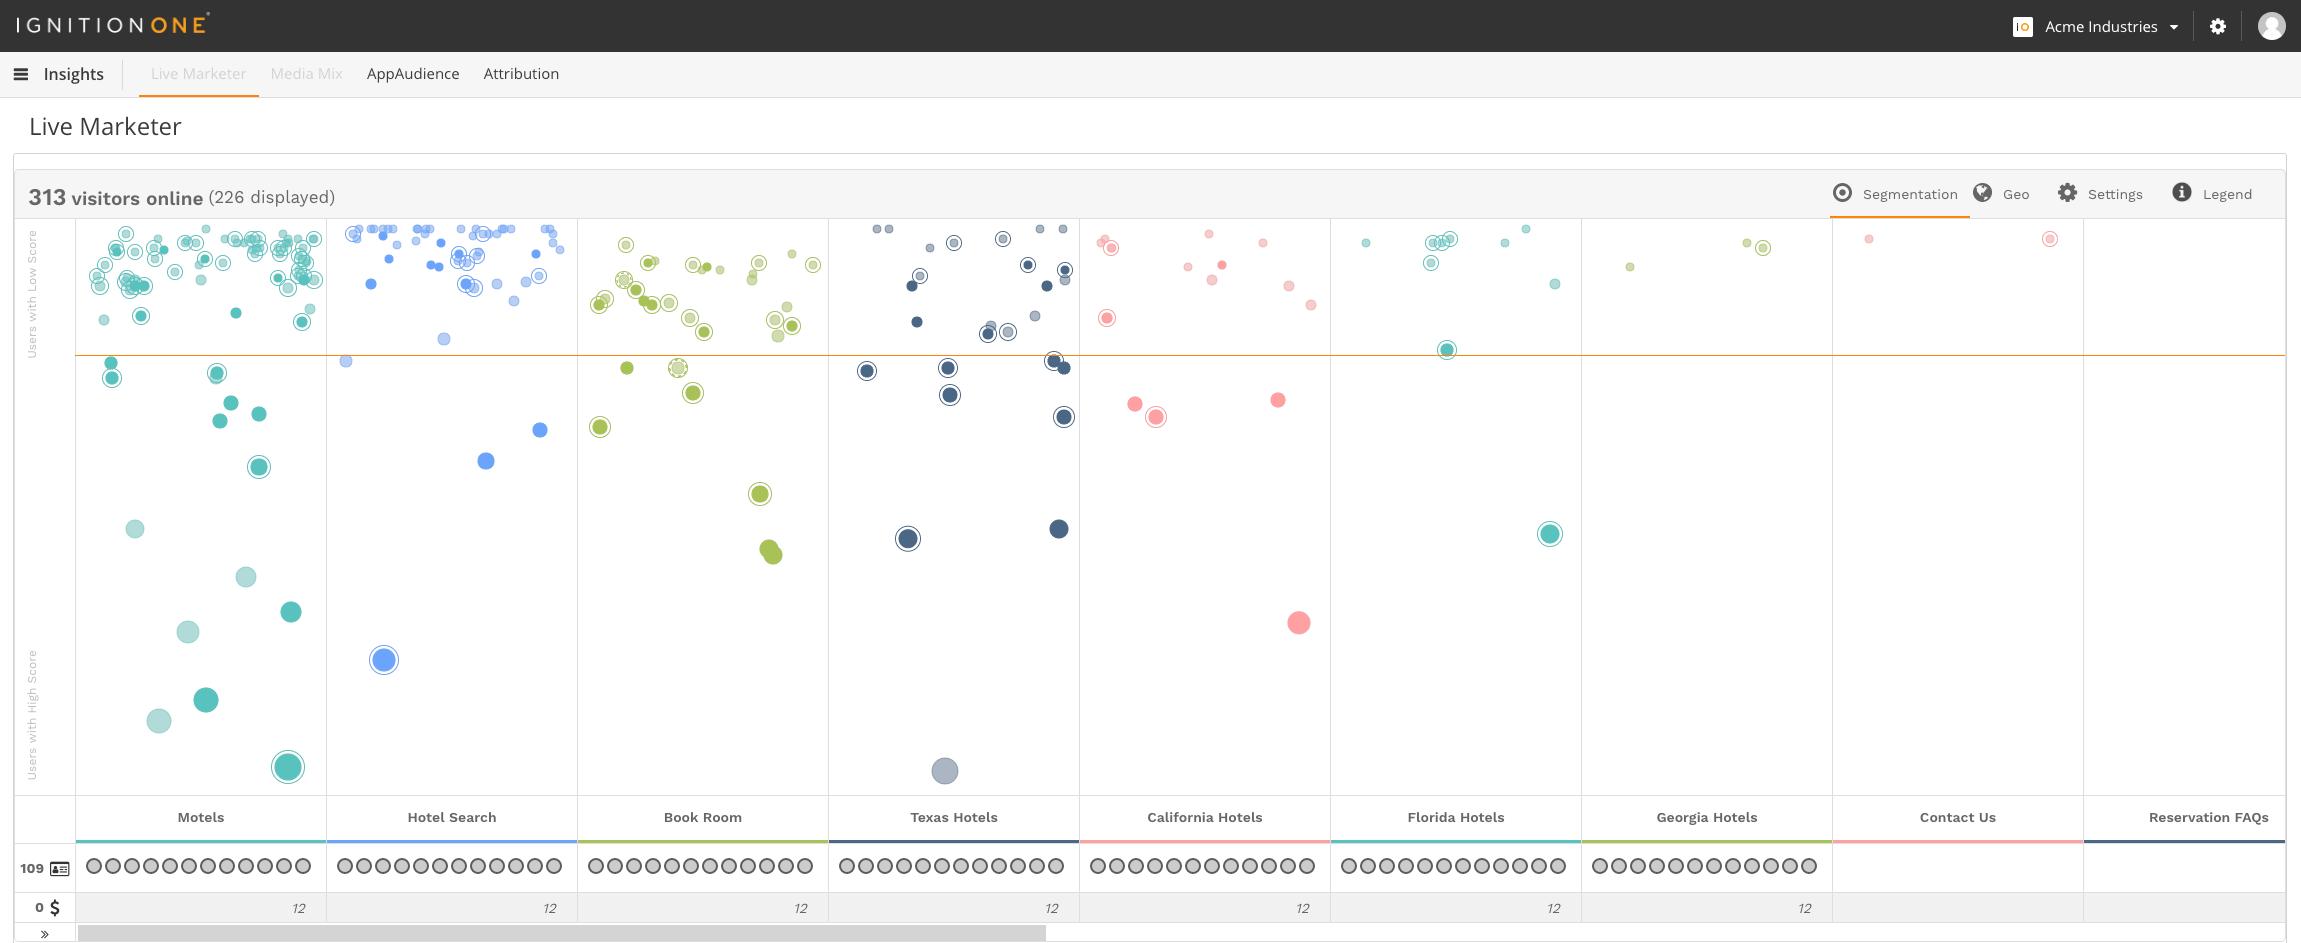 IgnitionOne Customer Intelligence Platform Demo - Live Marketer